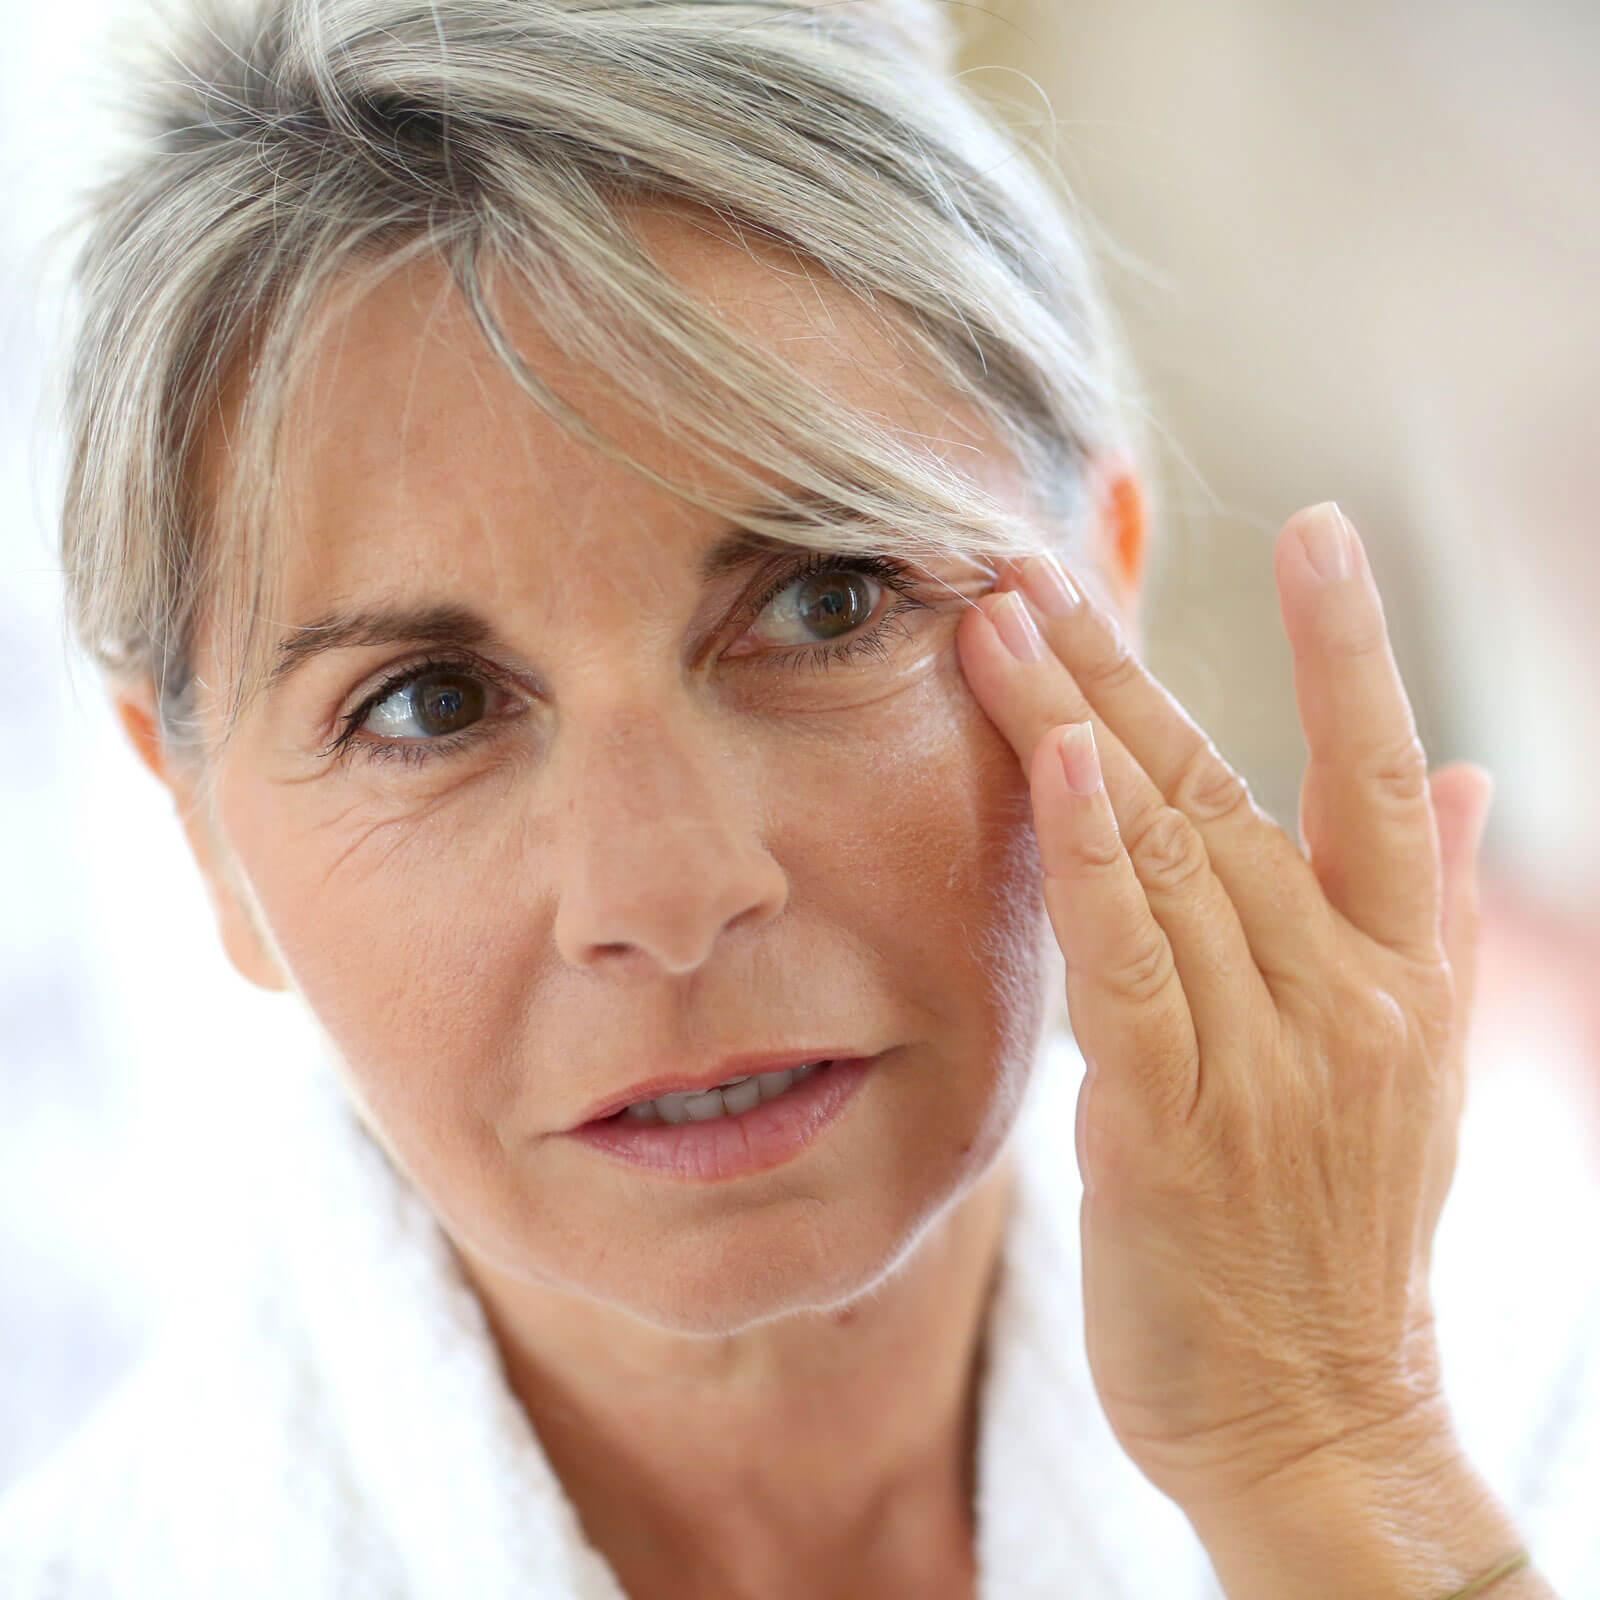 Causes of Lines & Wrinkles